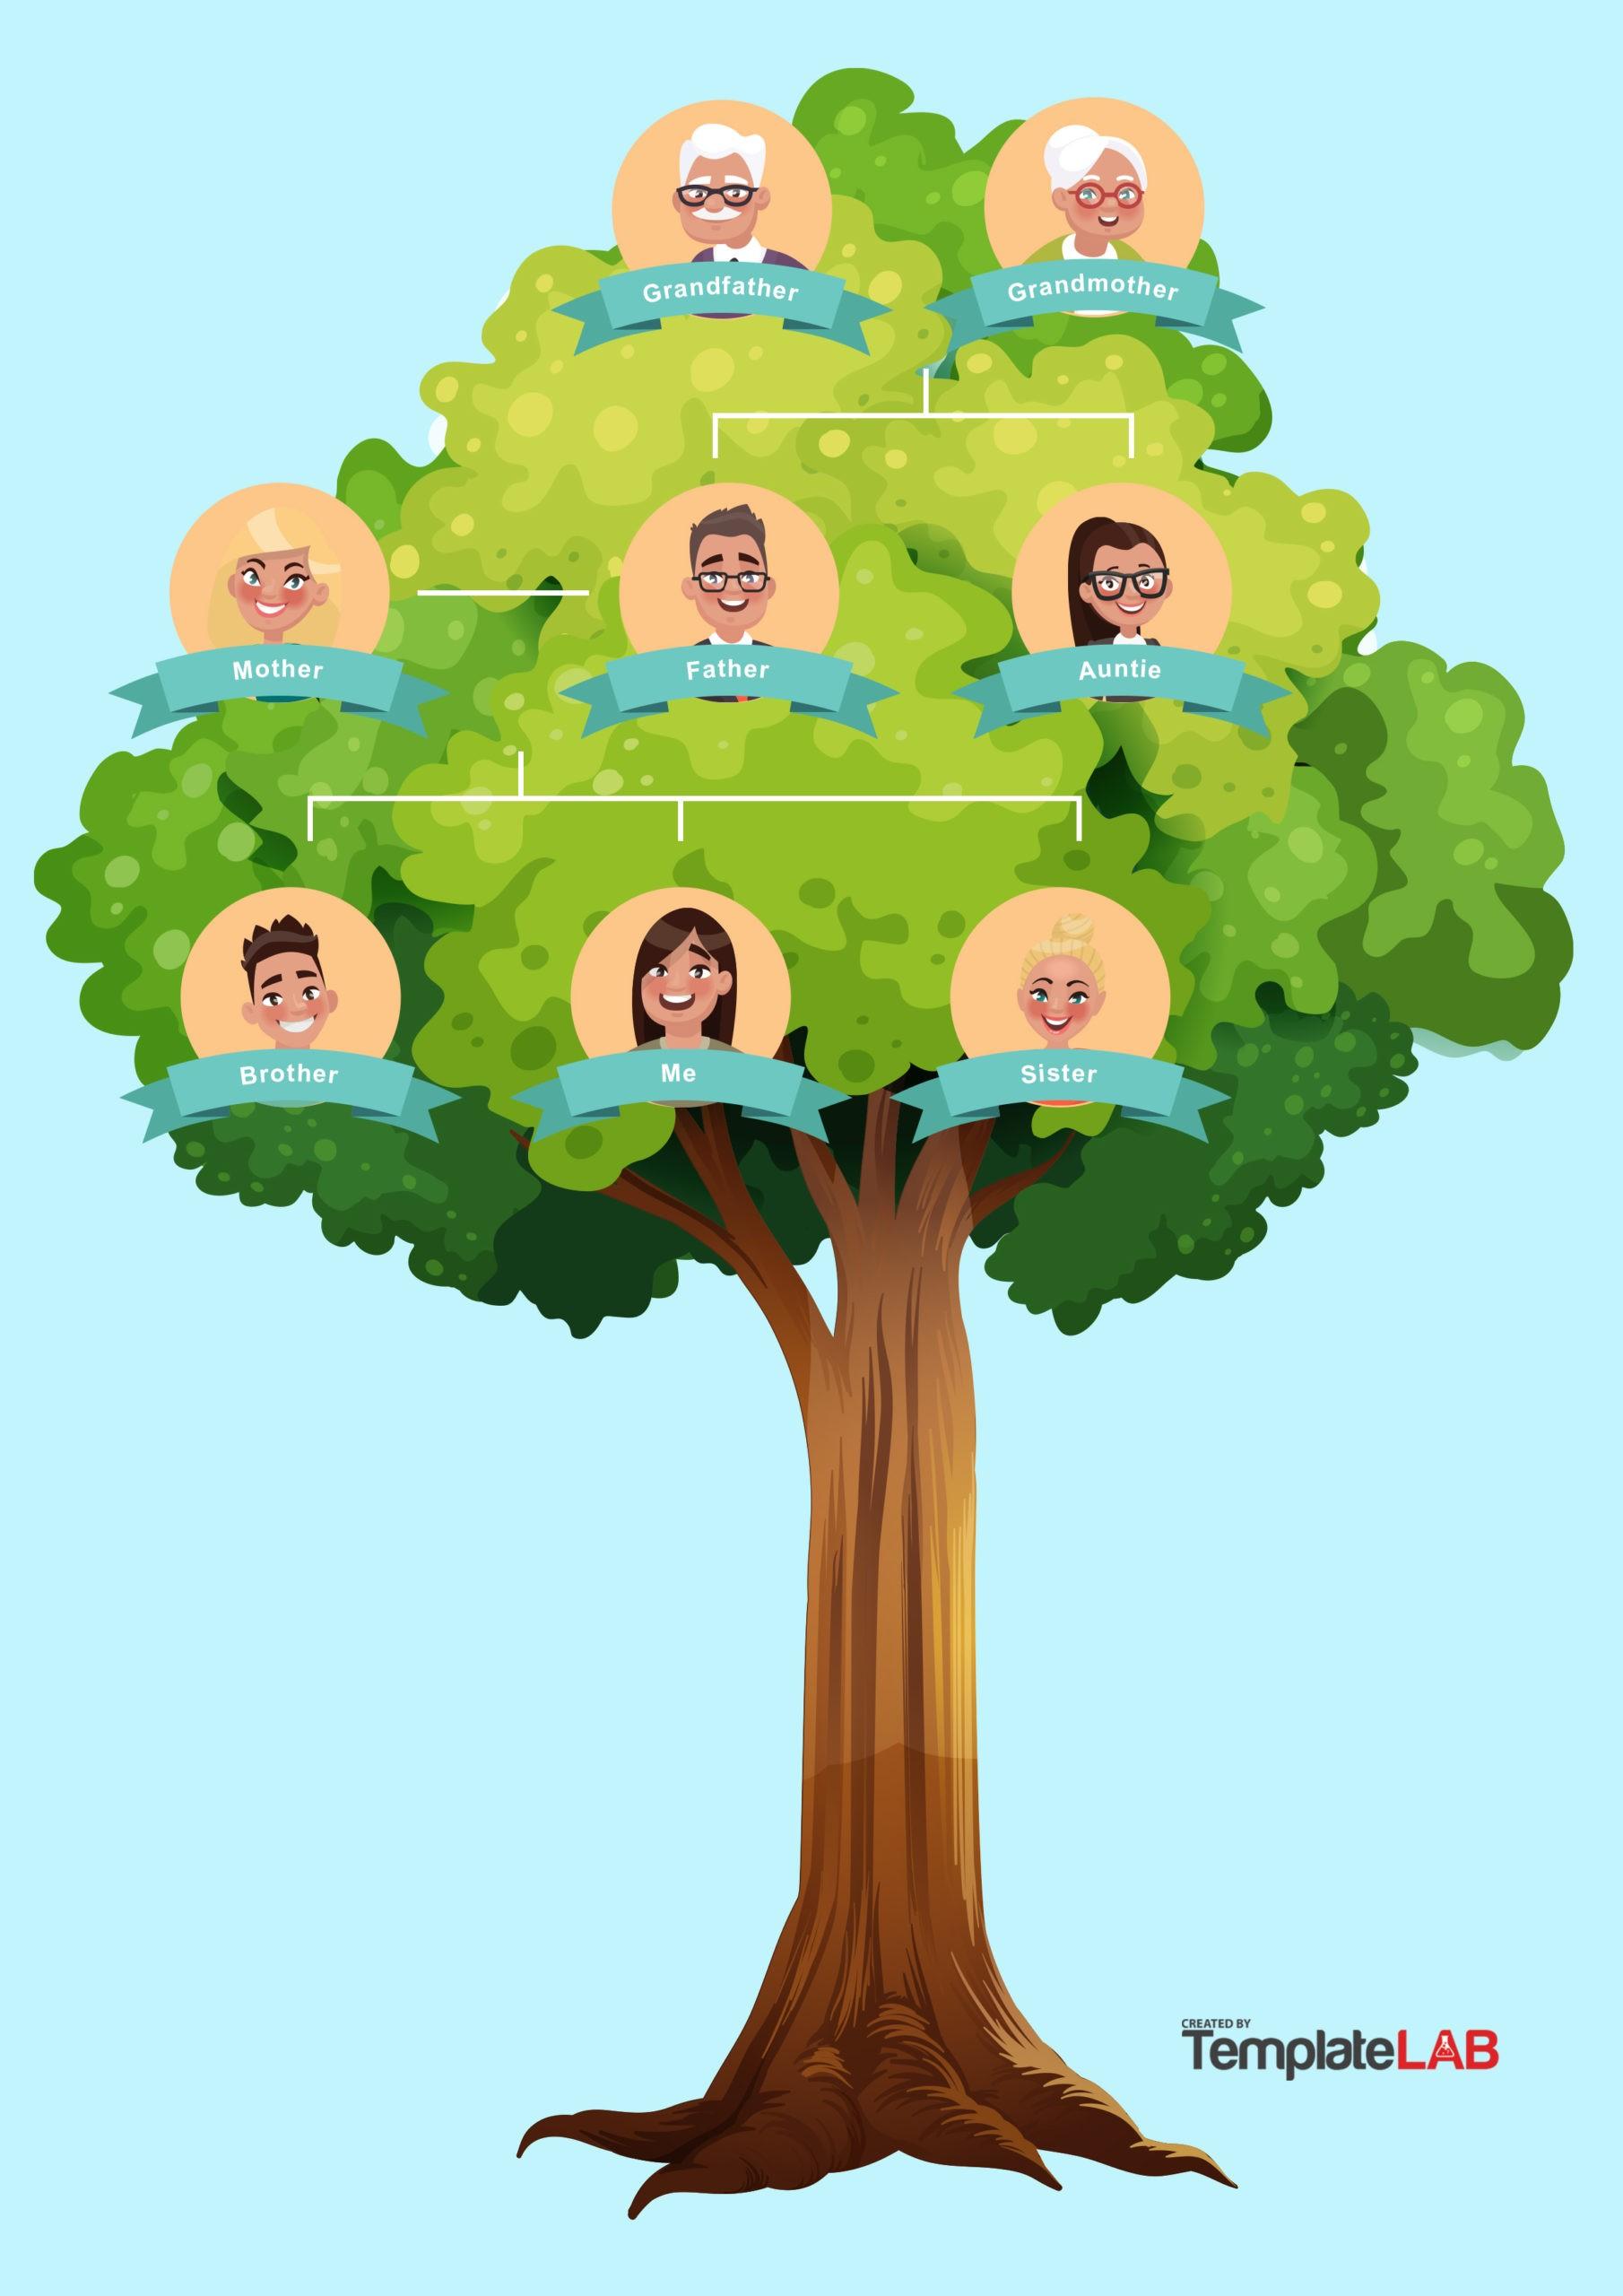 Free Family Tree Template 17 - TemplateLab.com